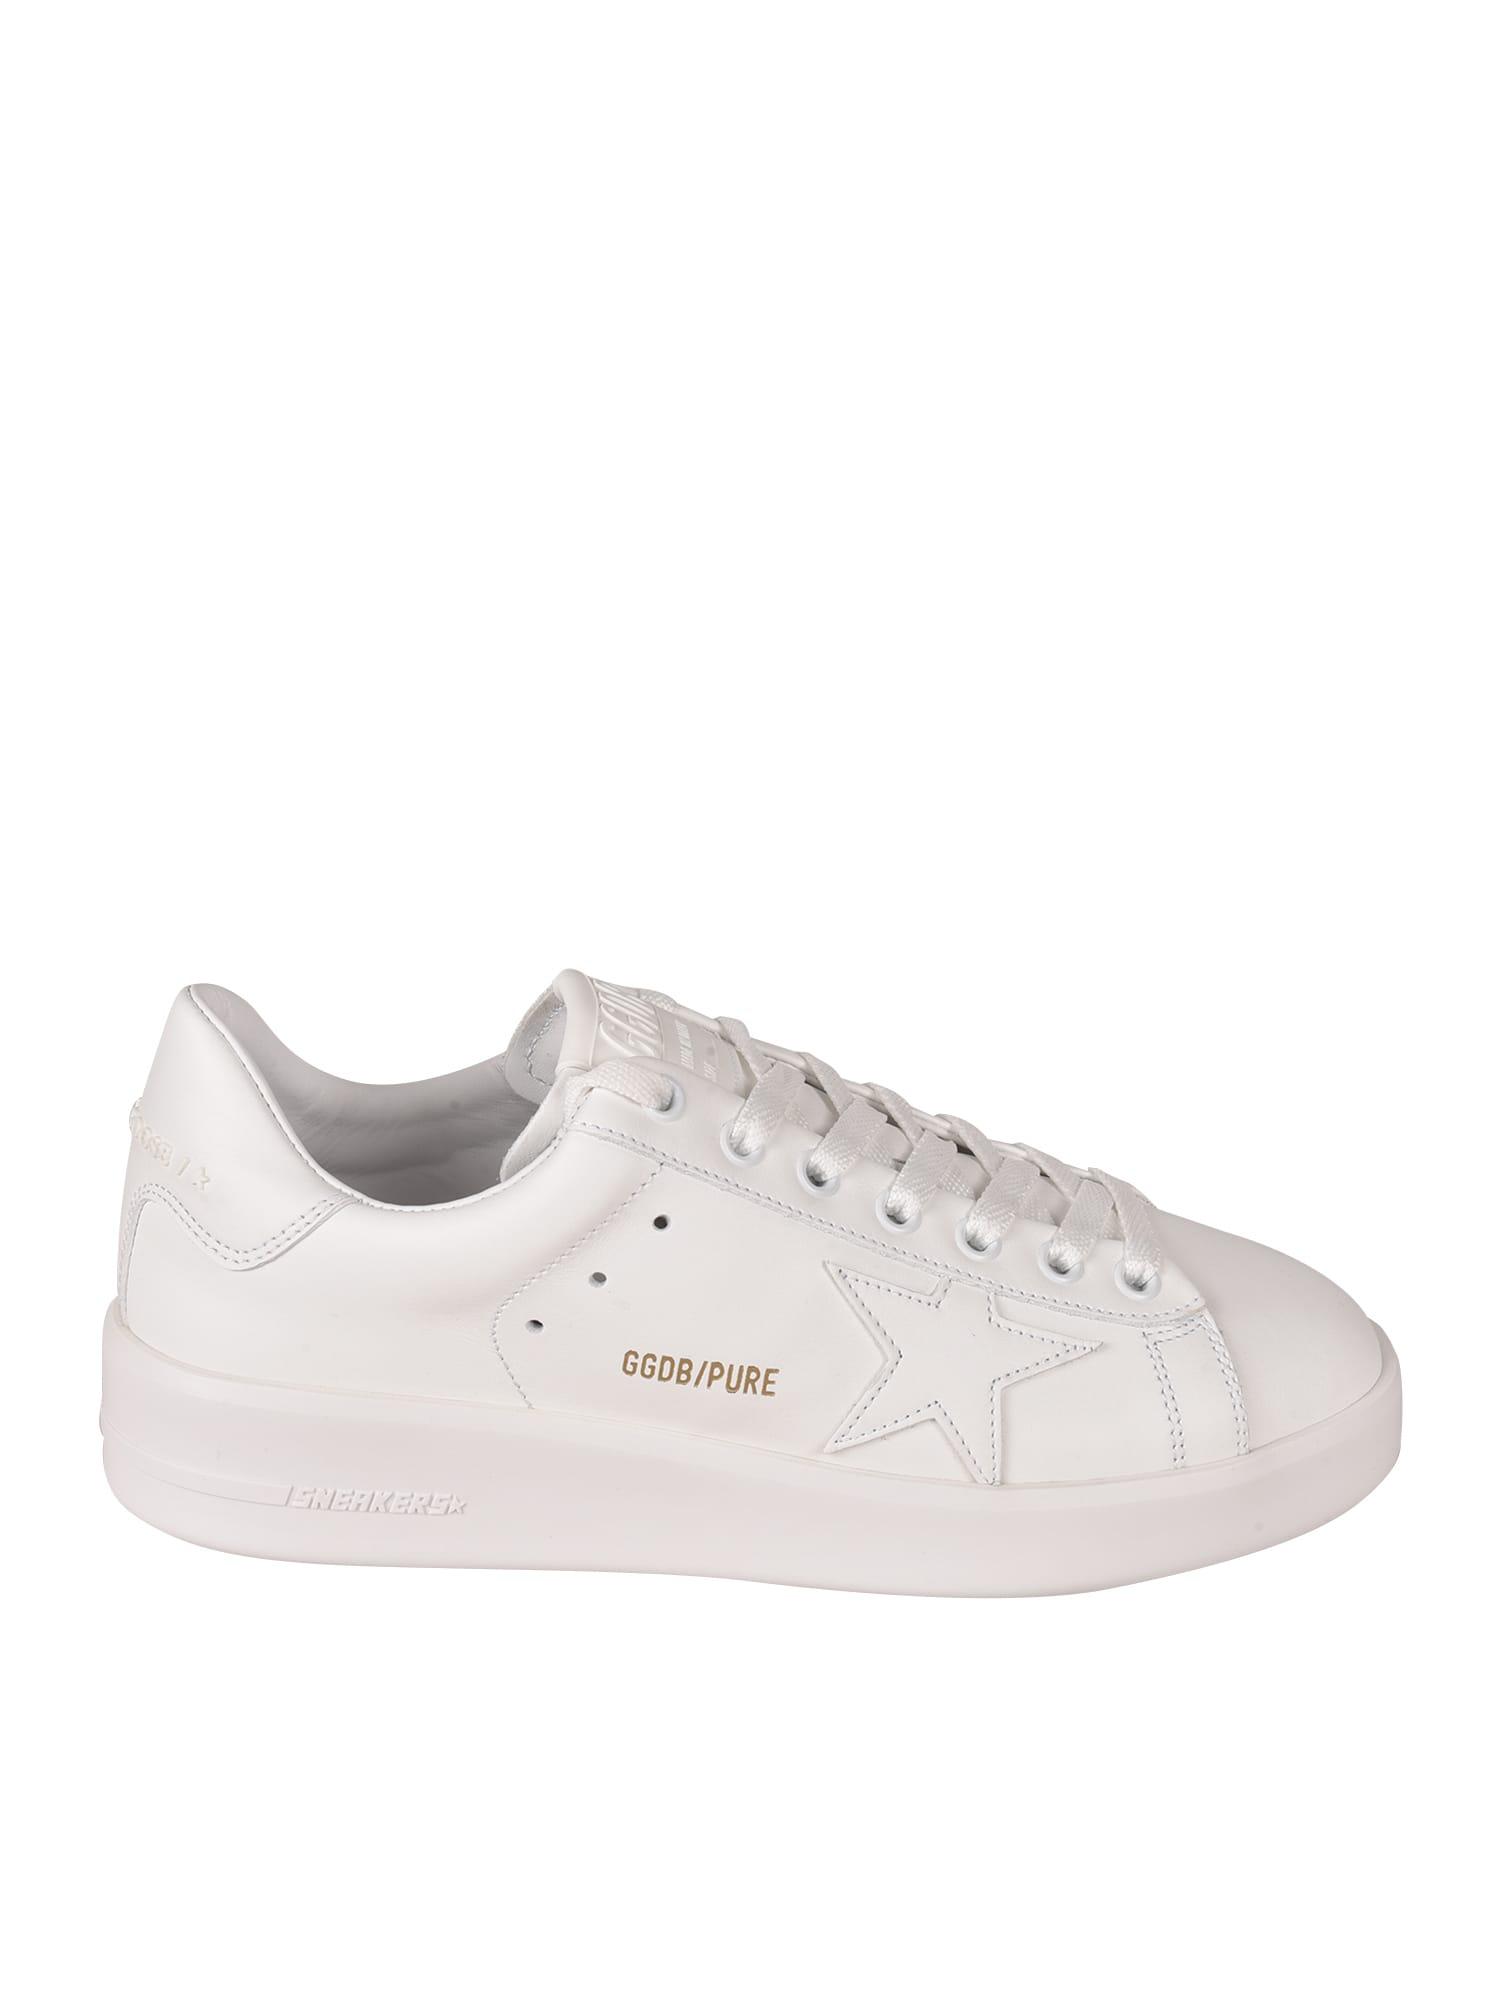 Golden Goose Pure Star New Sneakers